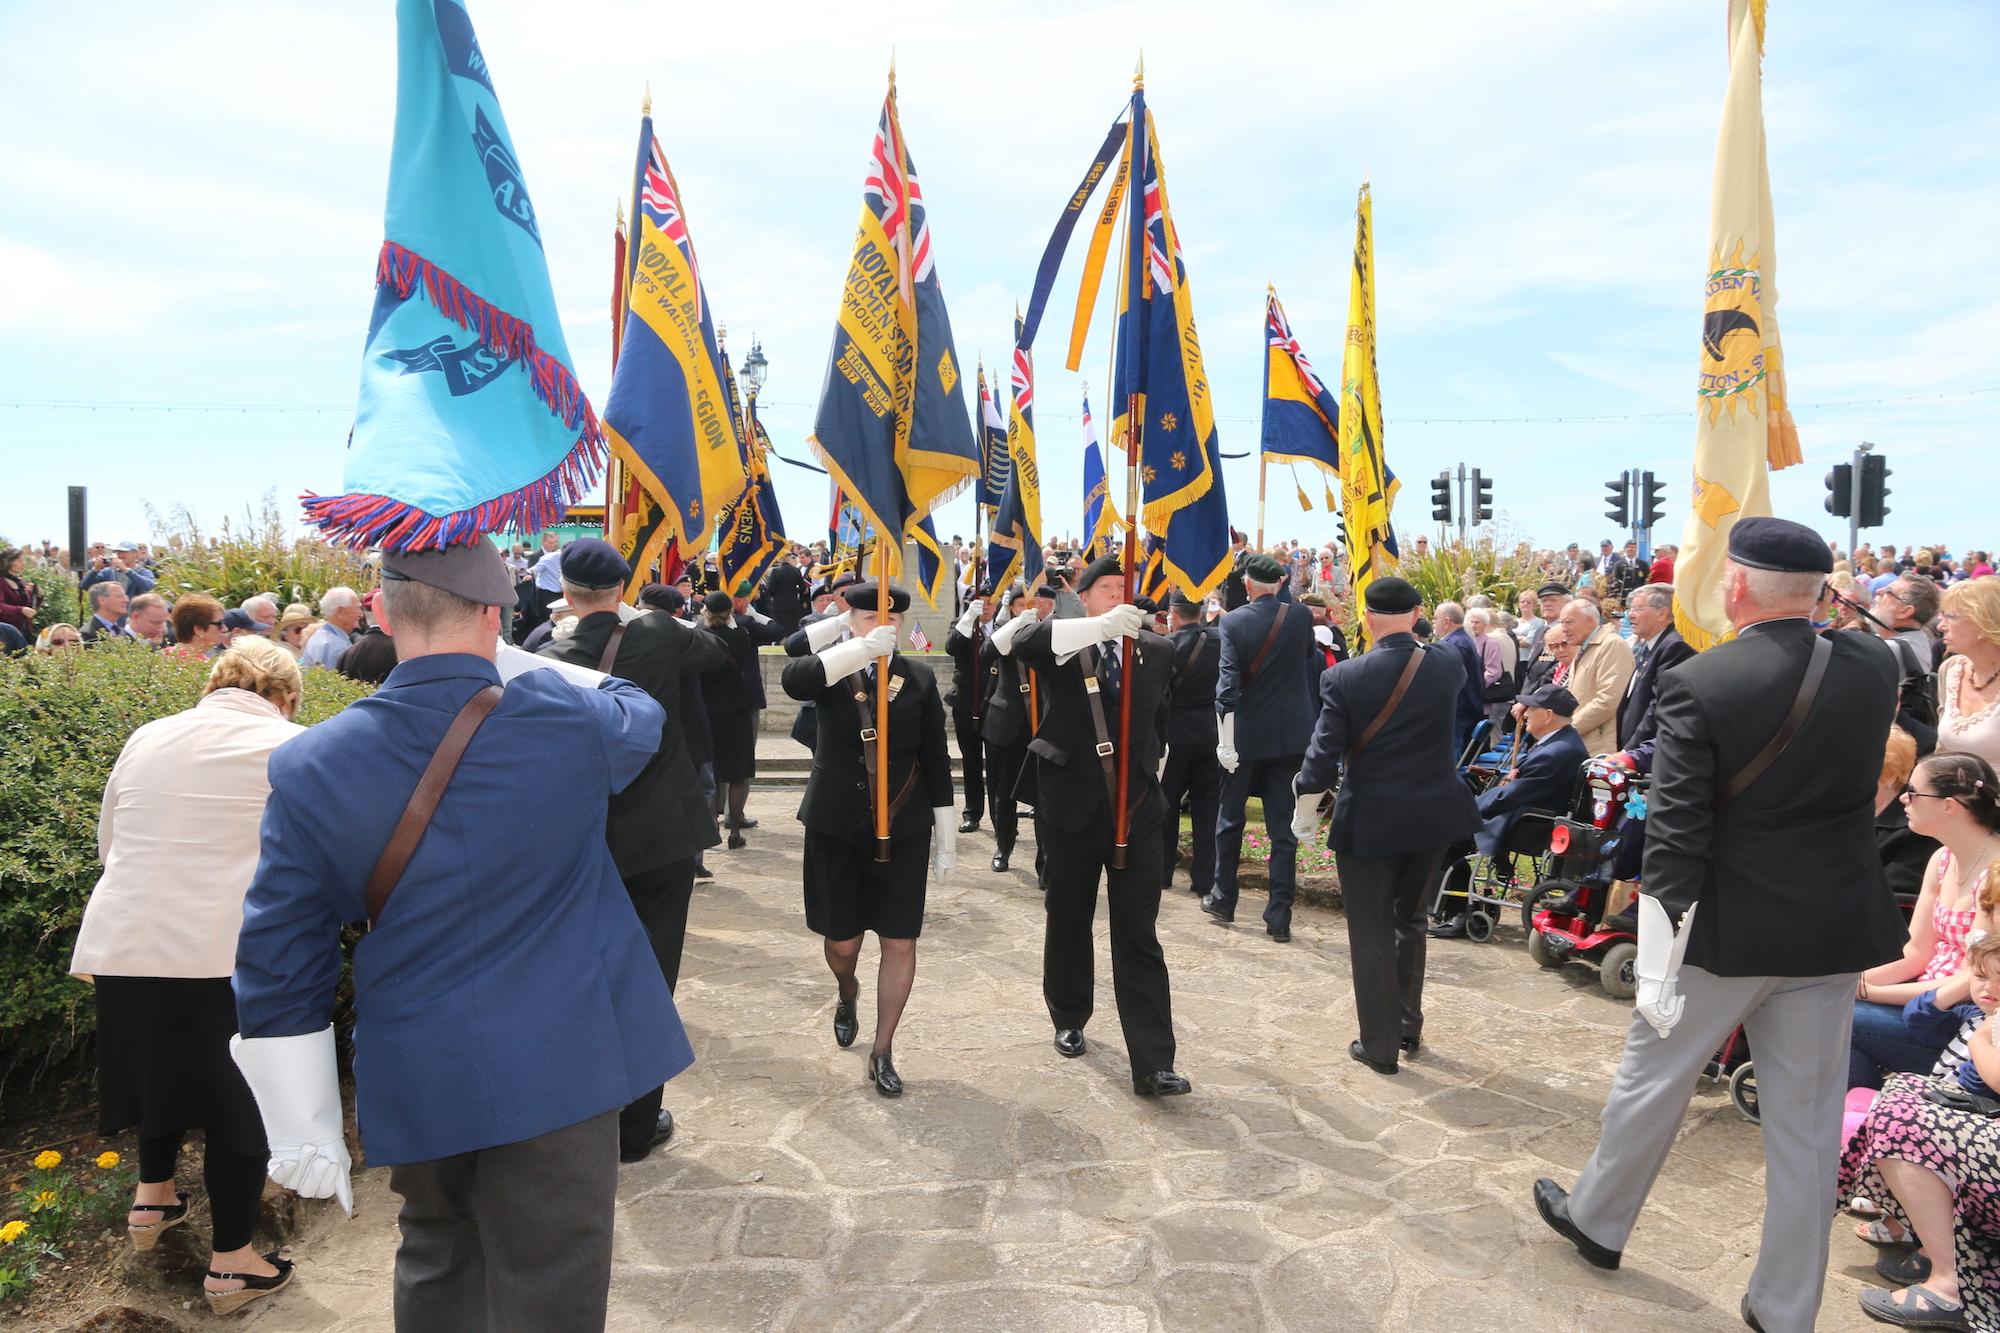 d-day stone veterans southsea